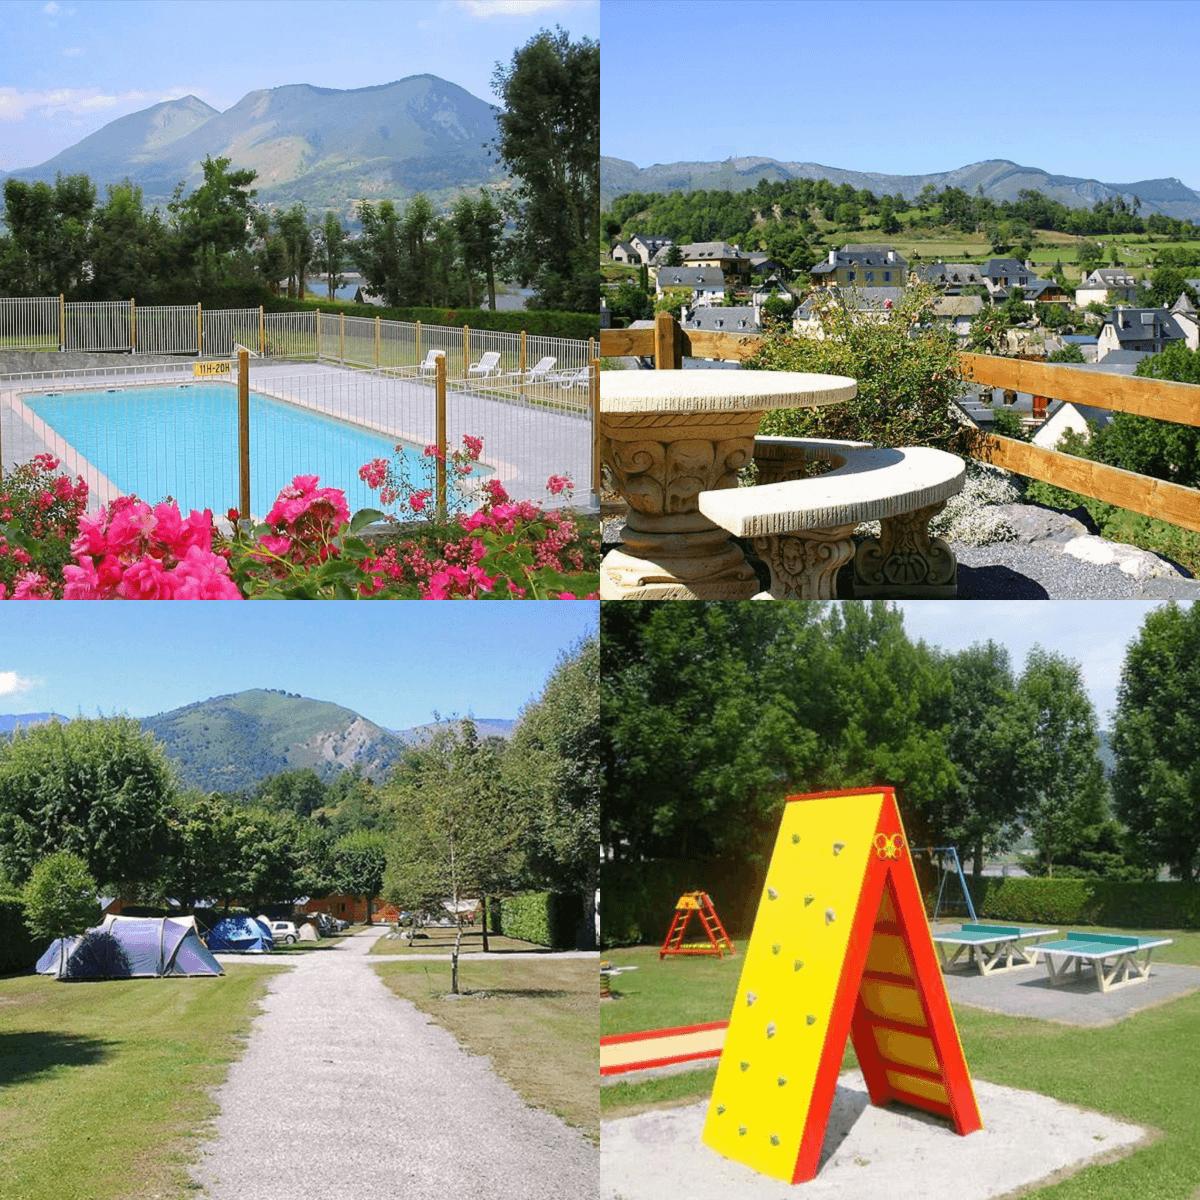 101 leuke idyllische campings in Frankrijk met kids #leukmetkids Camping Du Lac, Arcizans-Avant, Midi-Pyrénées, Pyreneeën